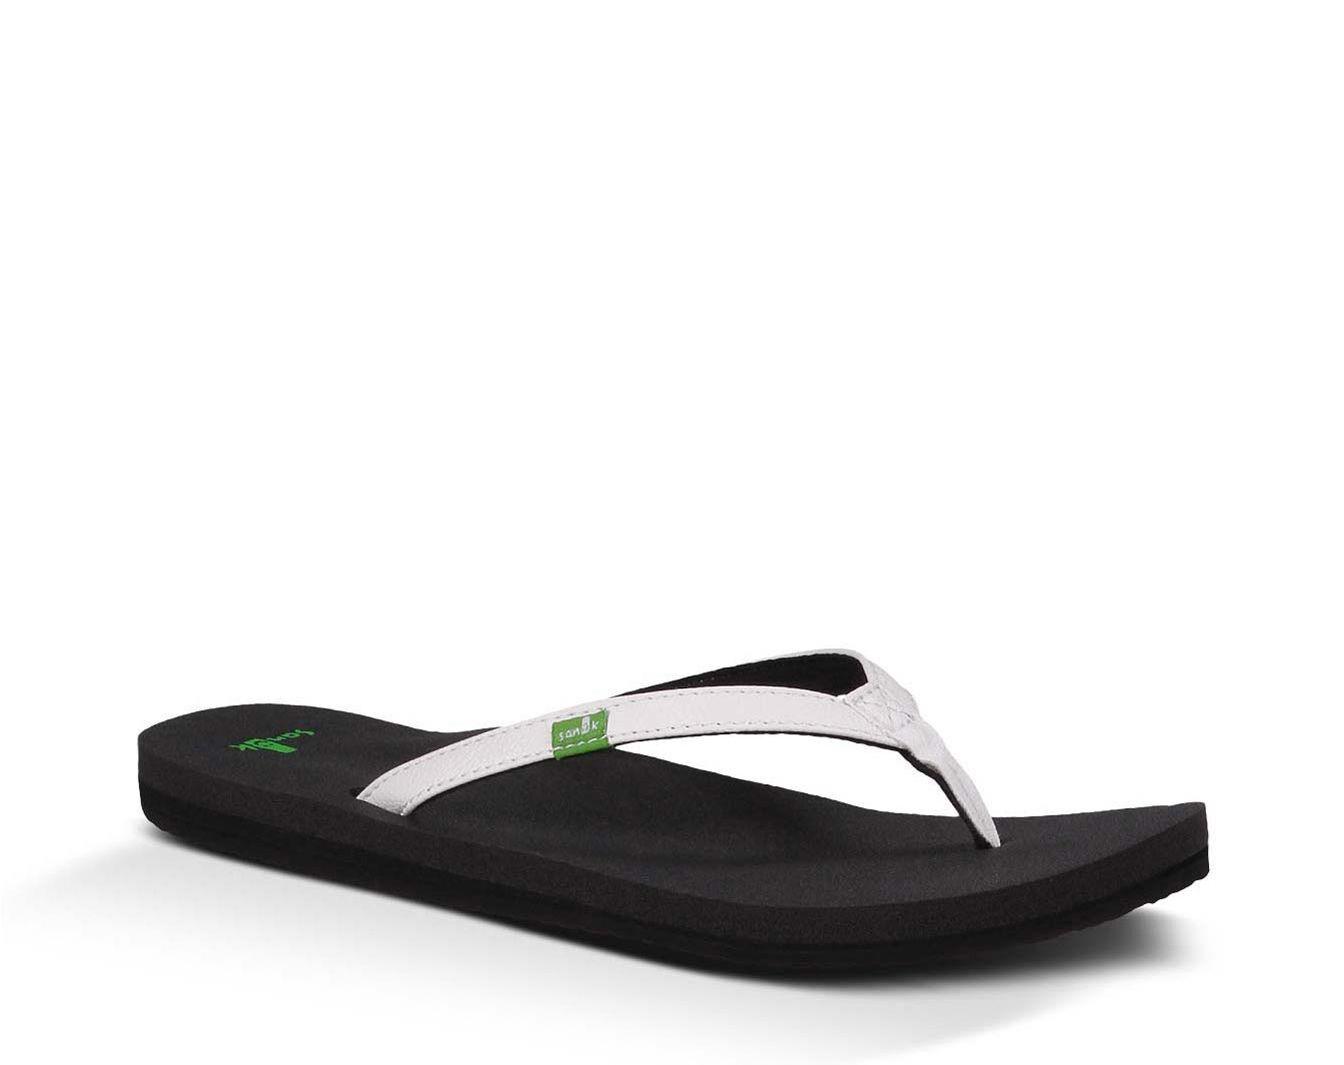 Top-Qualitat Sanuk Springwater Sandals